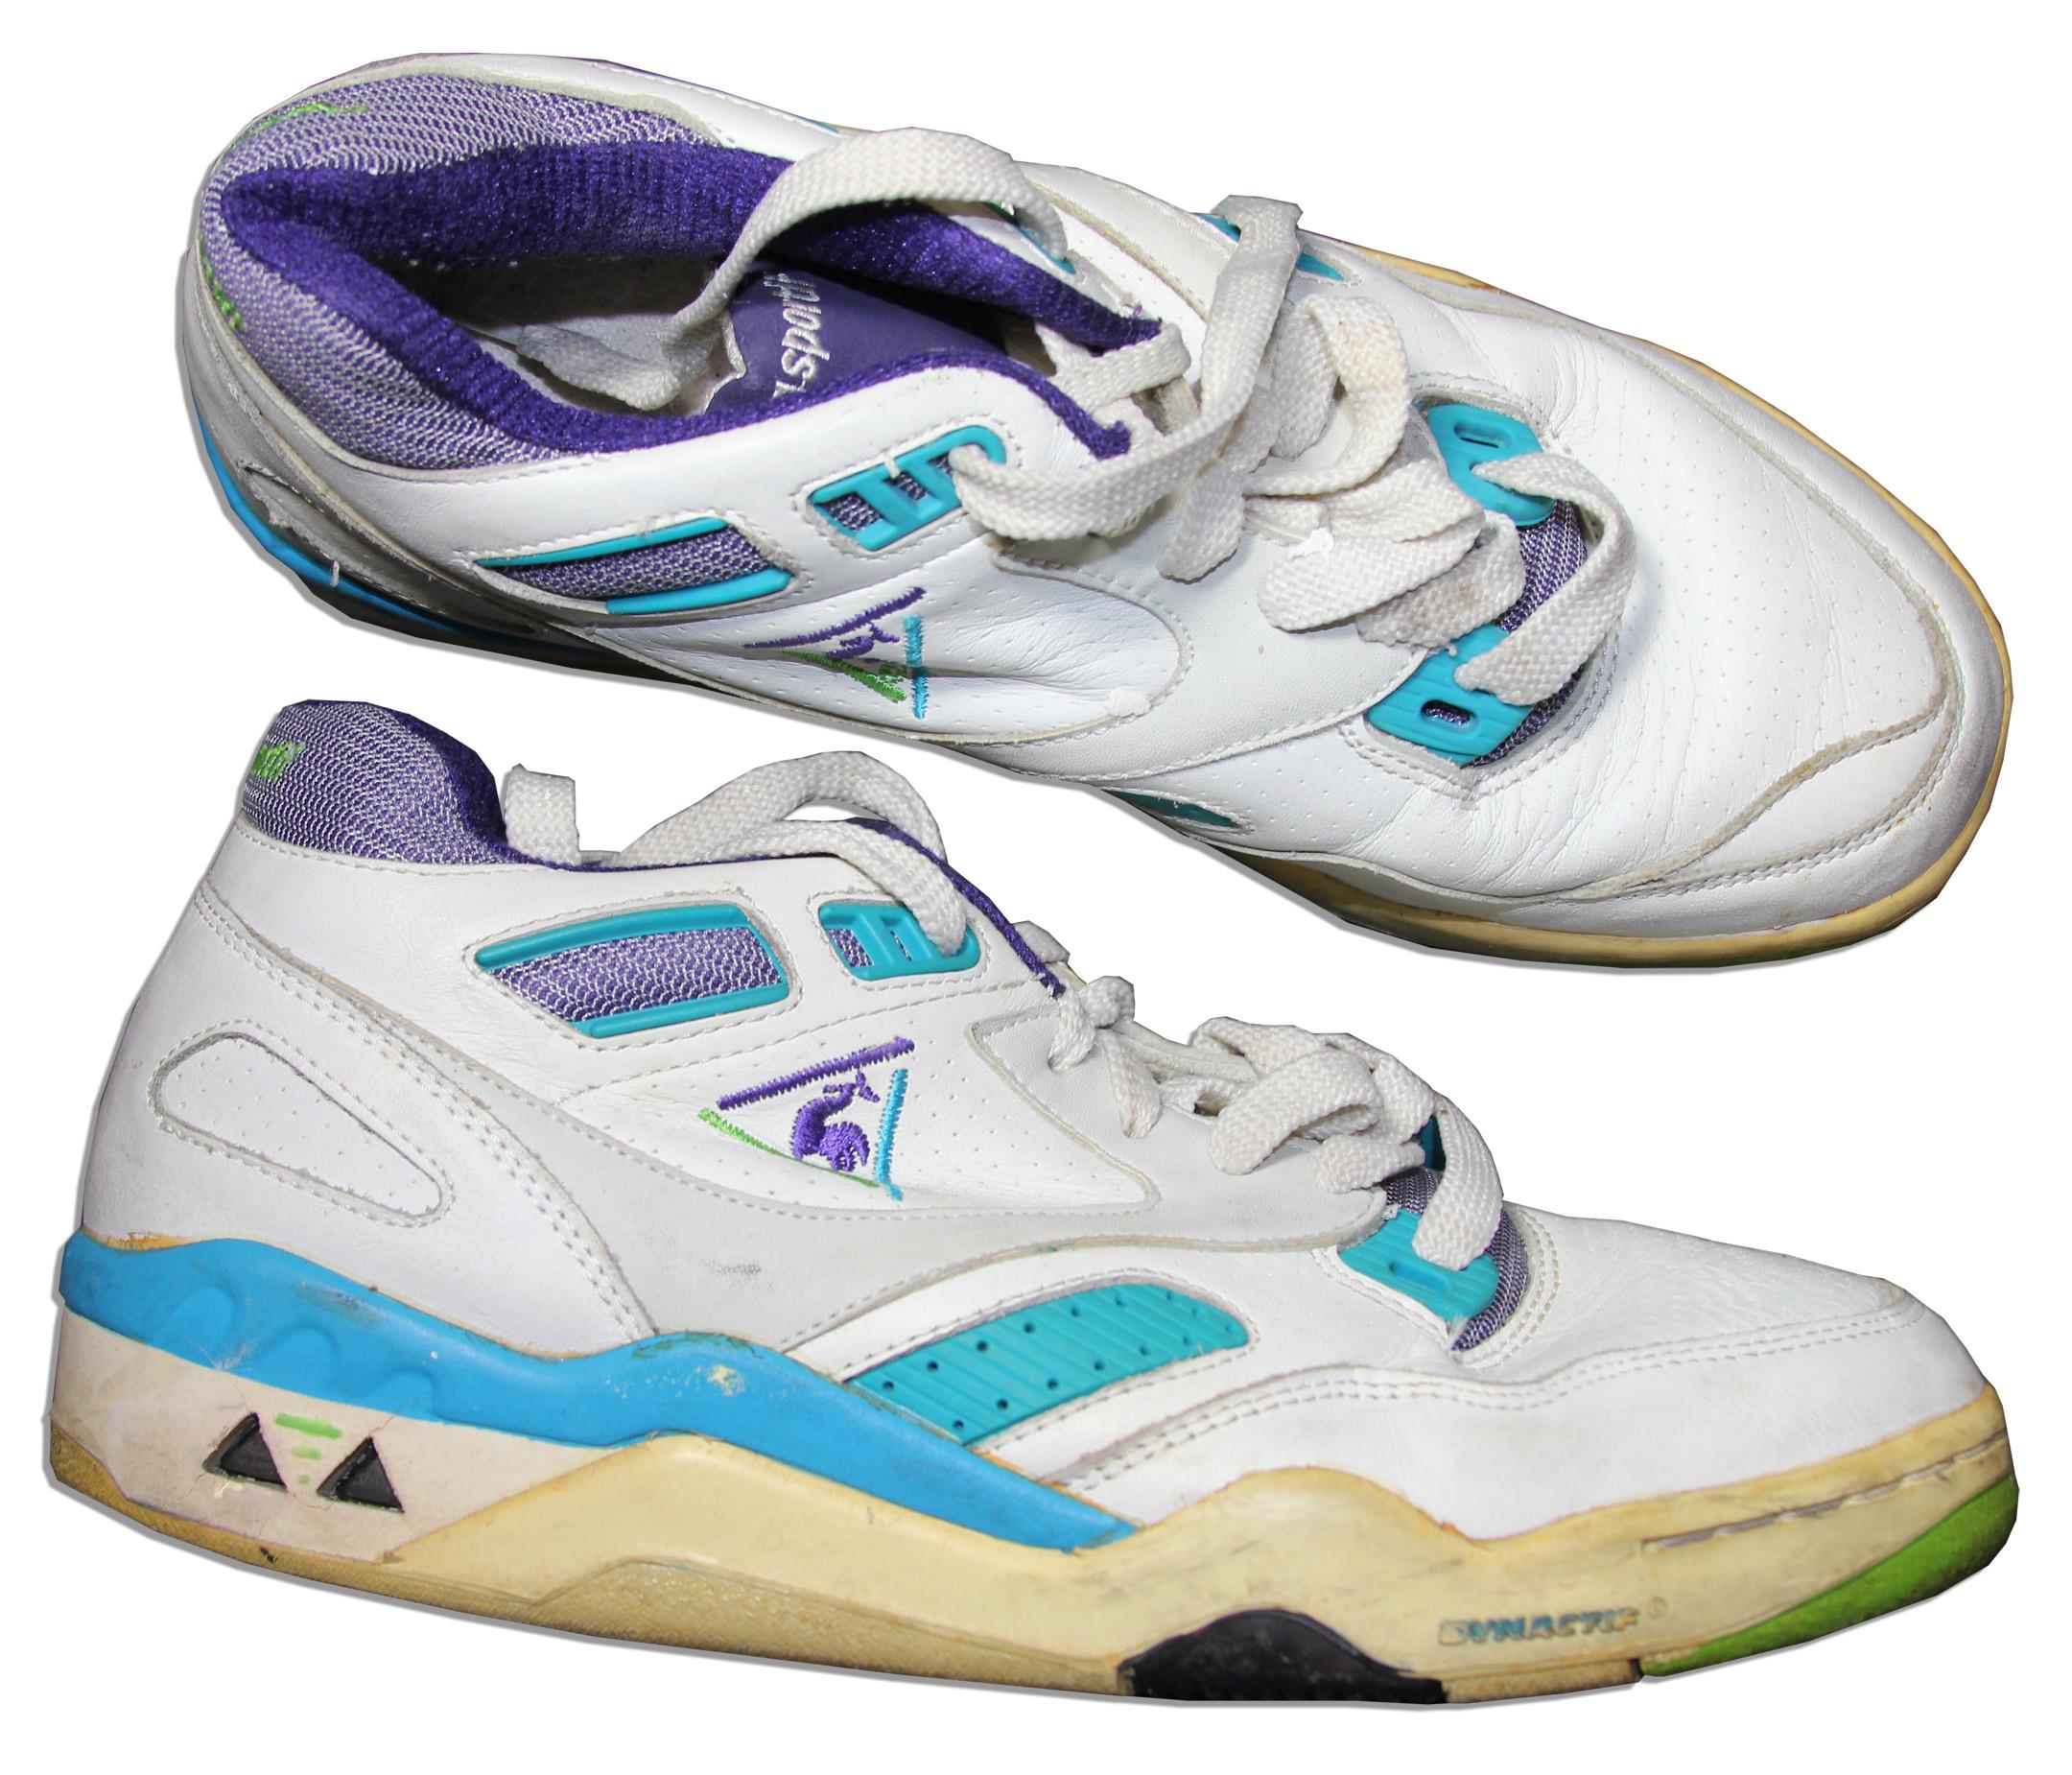 lot detail arthur ashe s tennis shoes